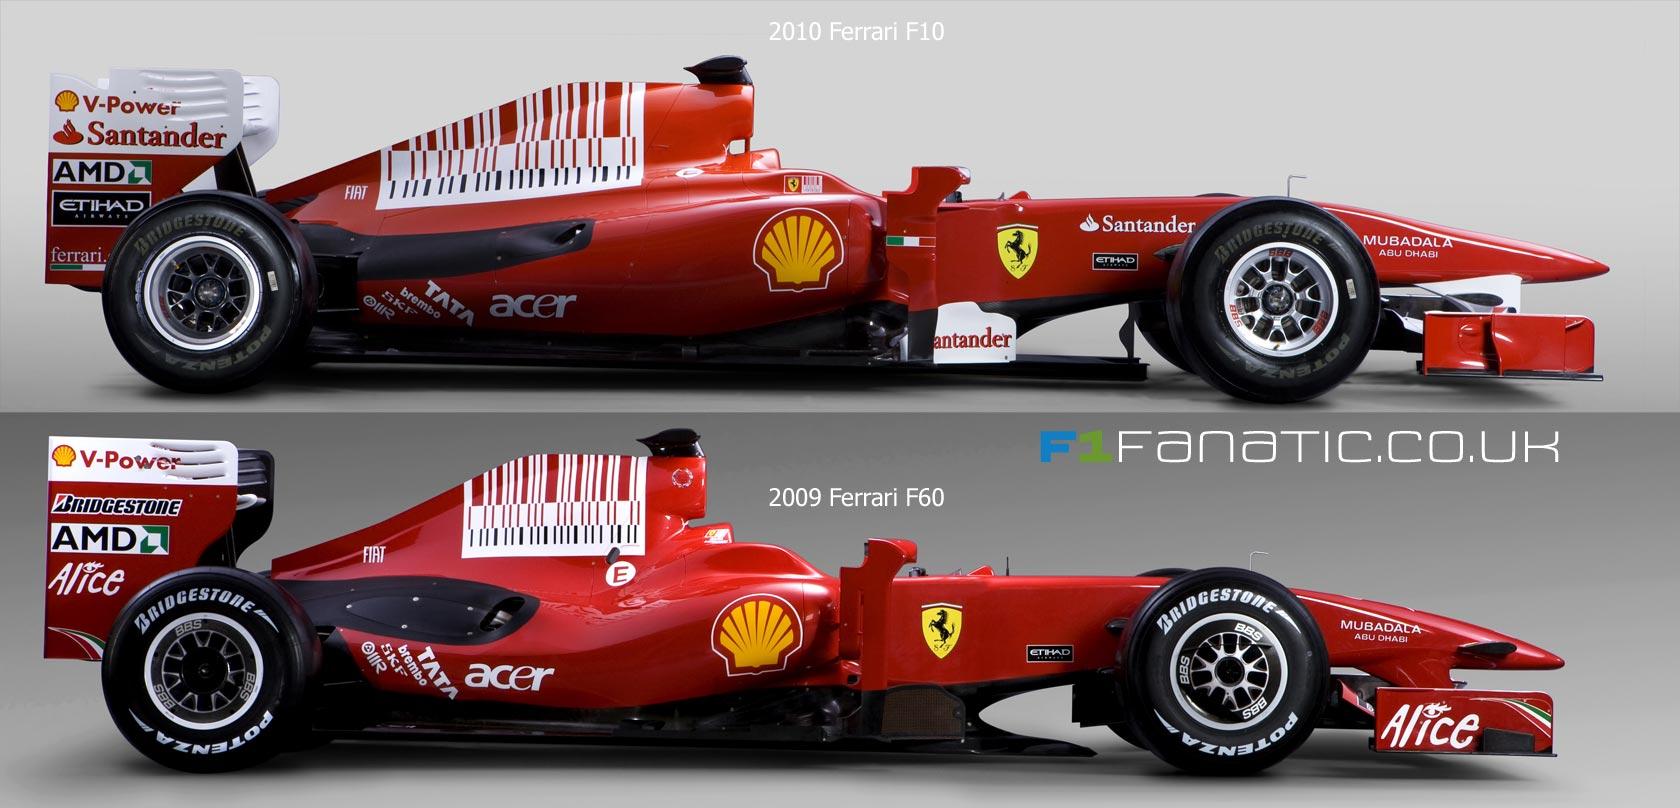 2010 Ferrari F10 and 2009 Ferrari F60 F1 Side by Side Pictures World Cars Wallpaper For Desktop